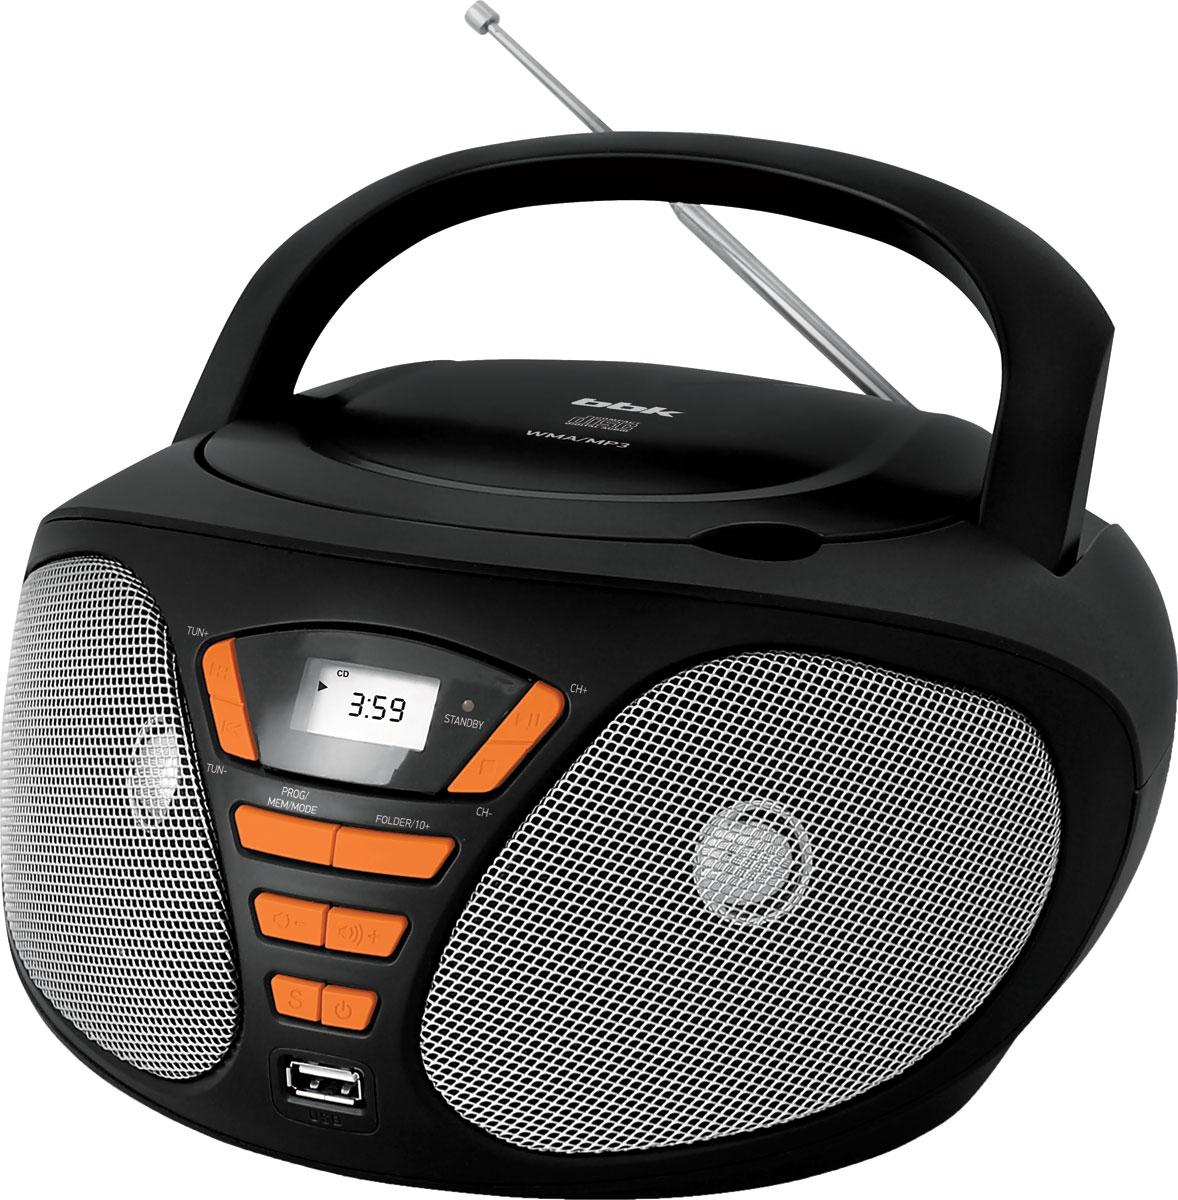 Магнитола BBK BX180U, Black Orange CD/MP3 bbk bx180u white cyan cd mp3 магнитола